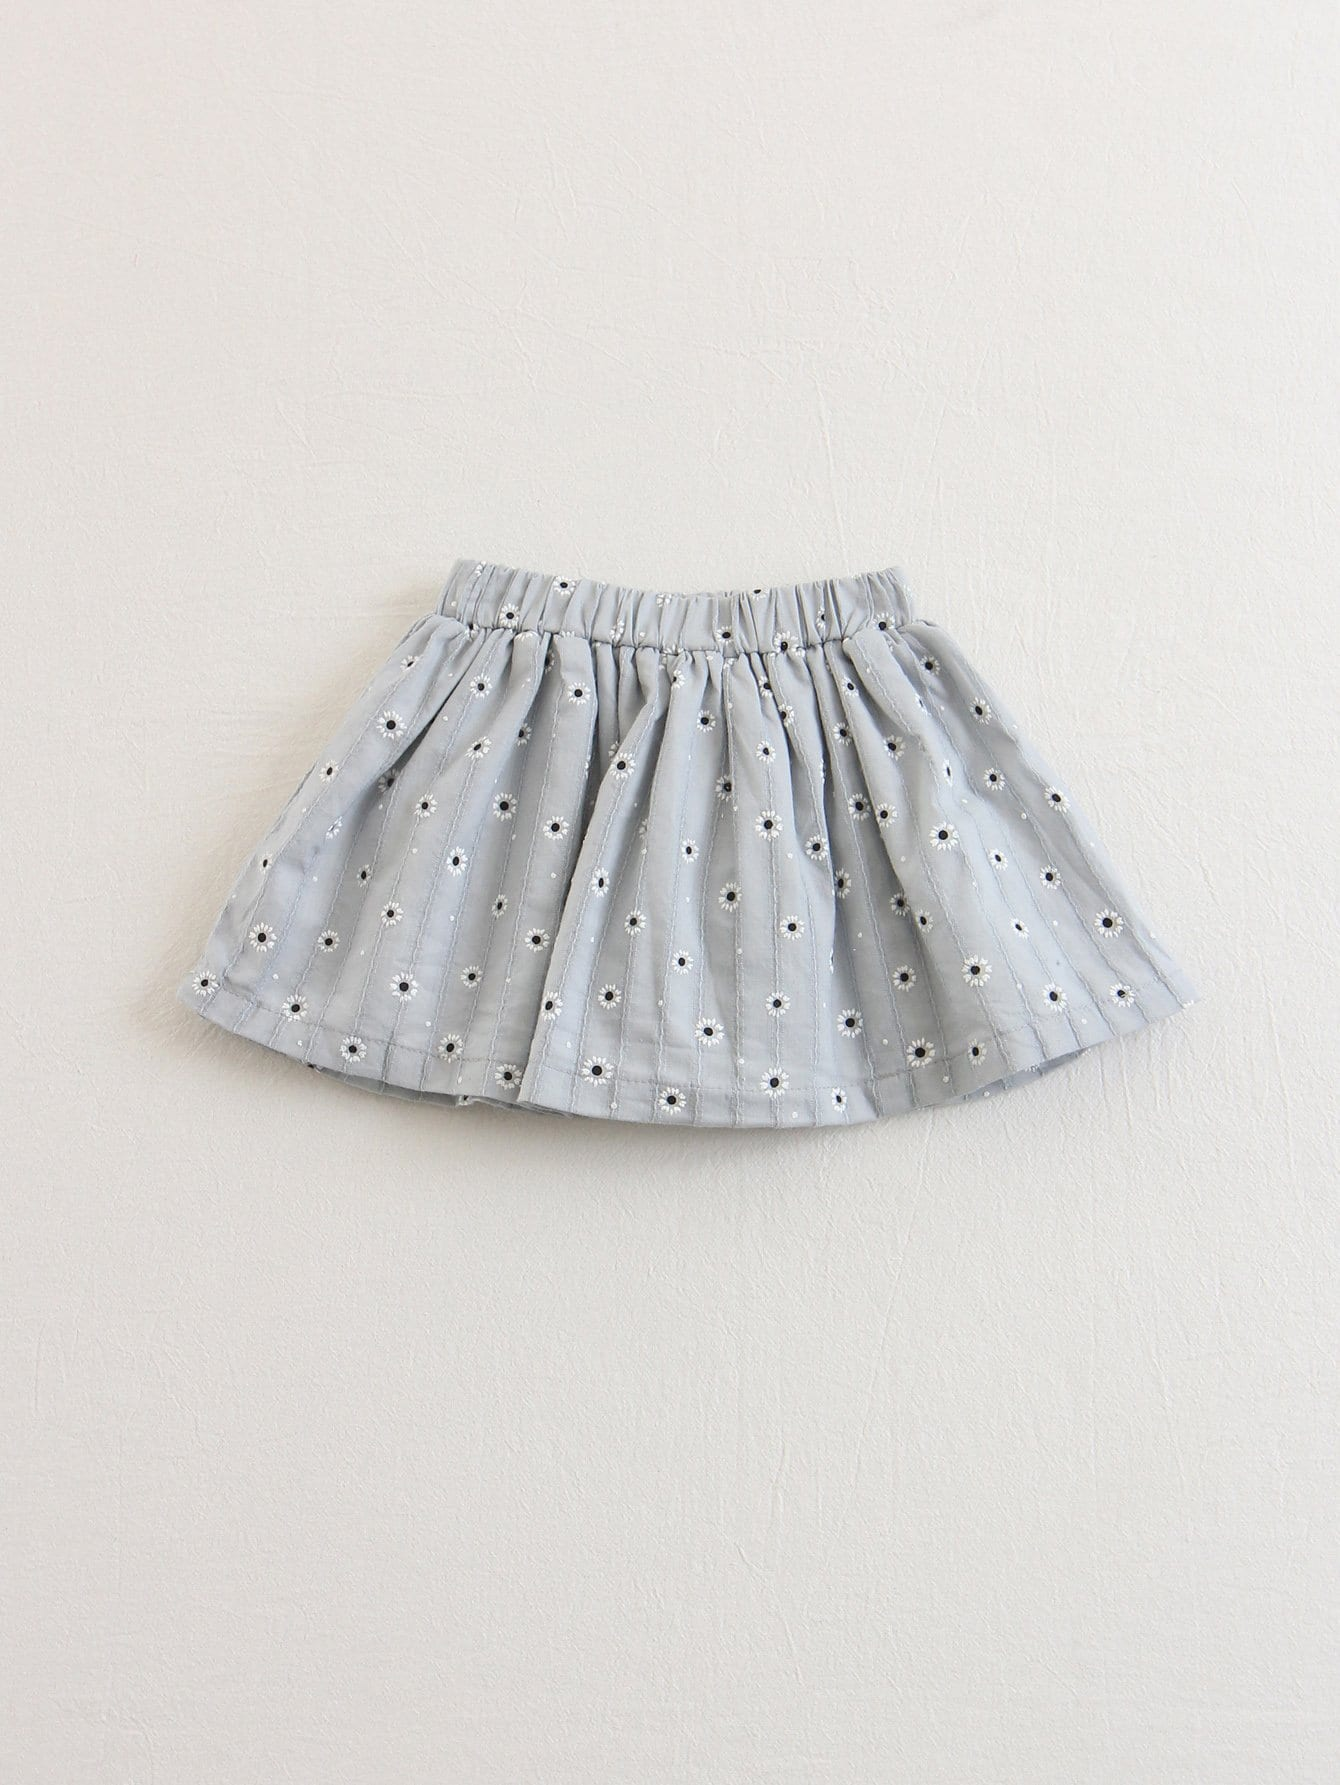 Kids Floral Elastic Waist Pleated Skirt bohemian high waist floral print skirt for women